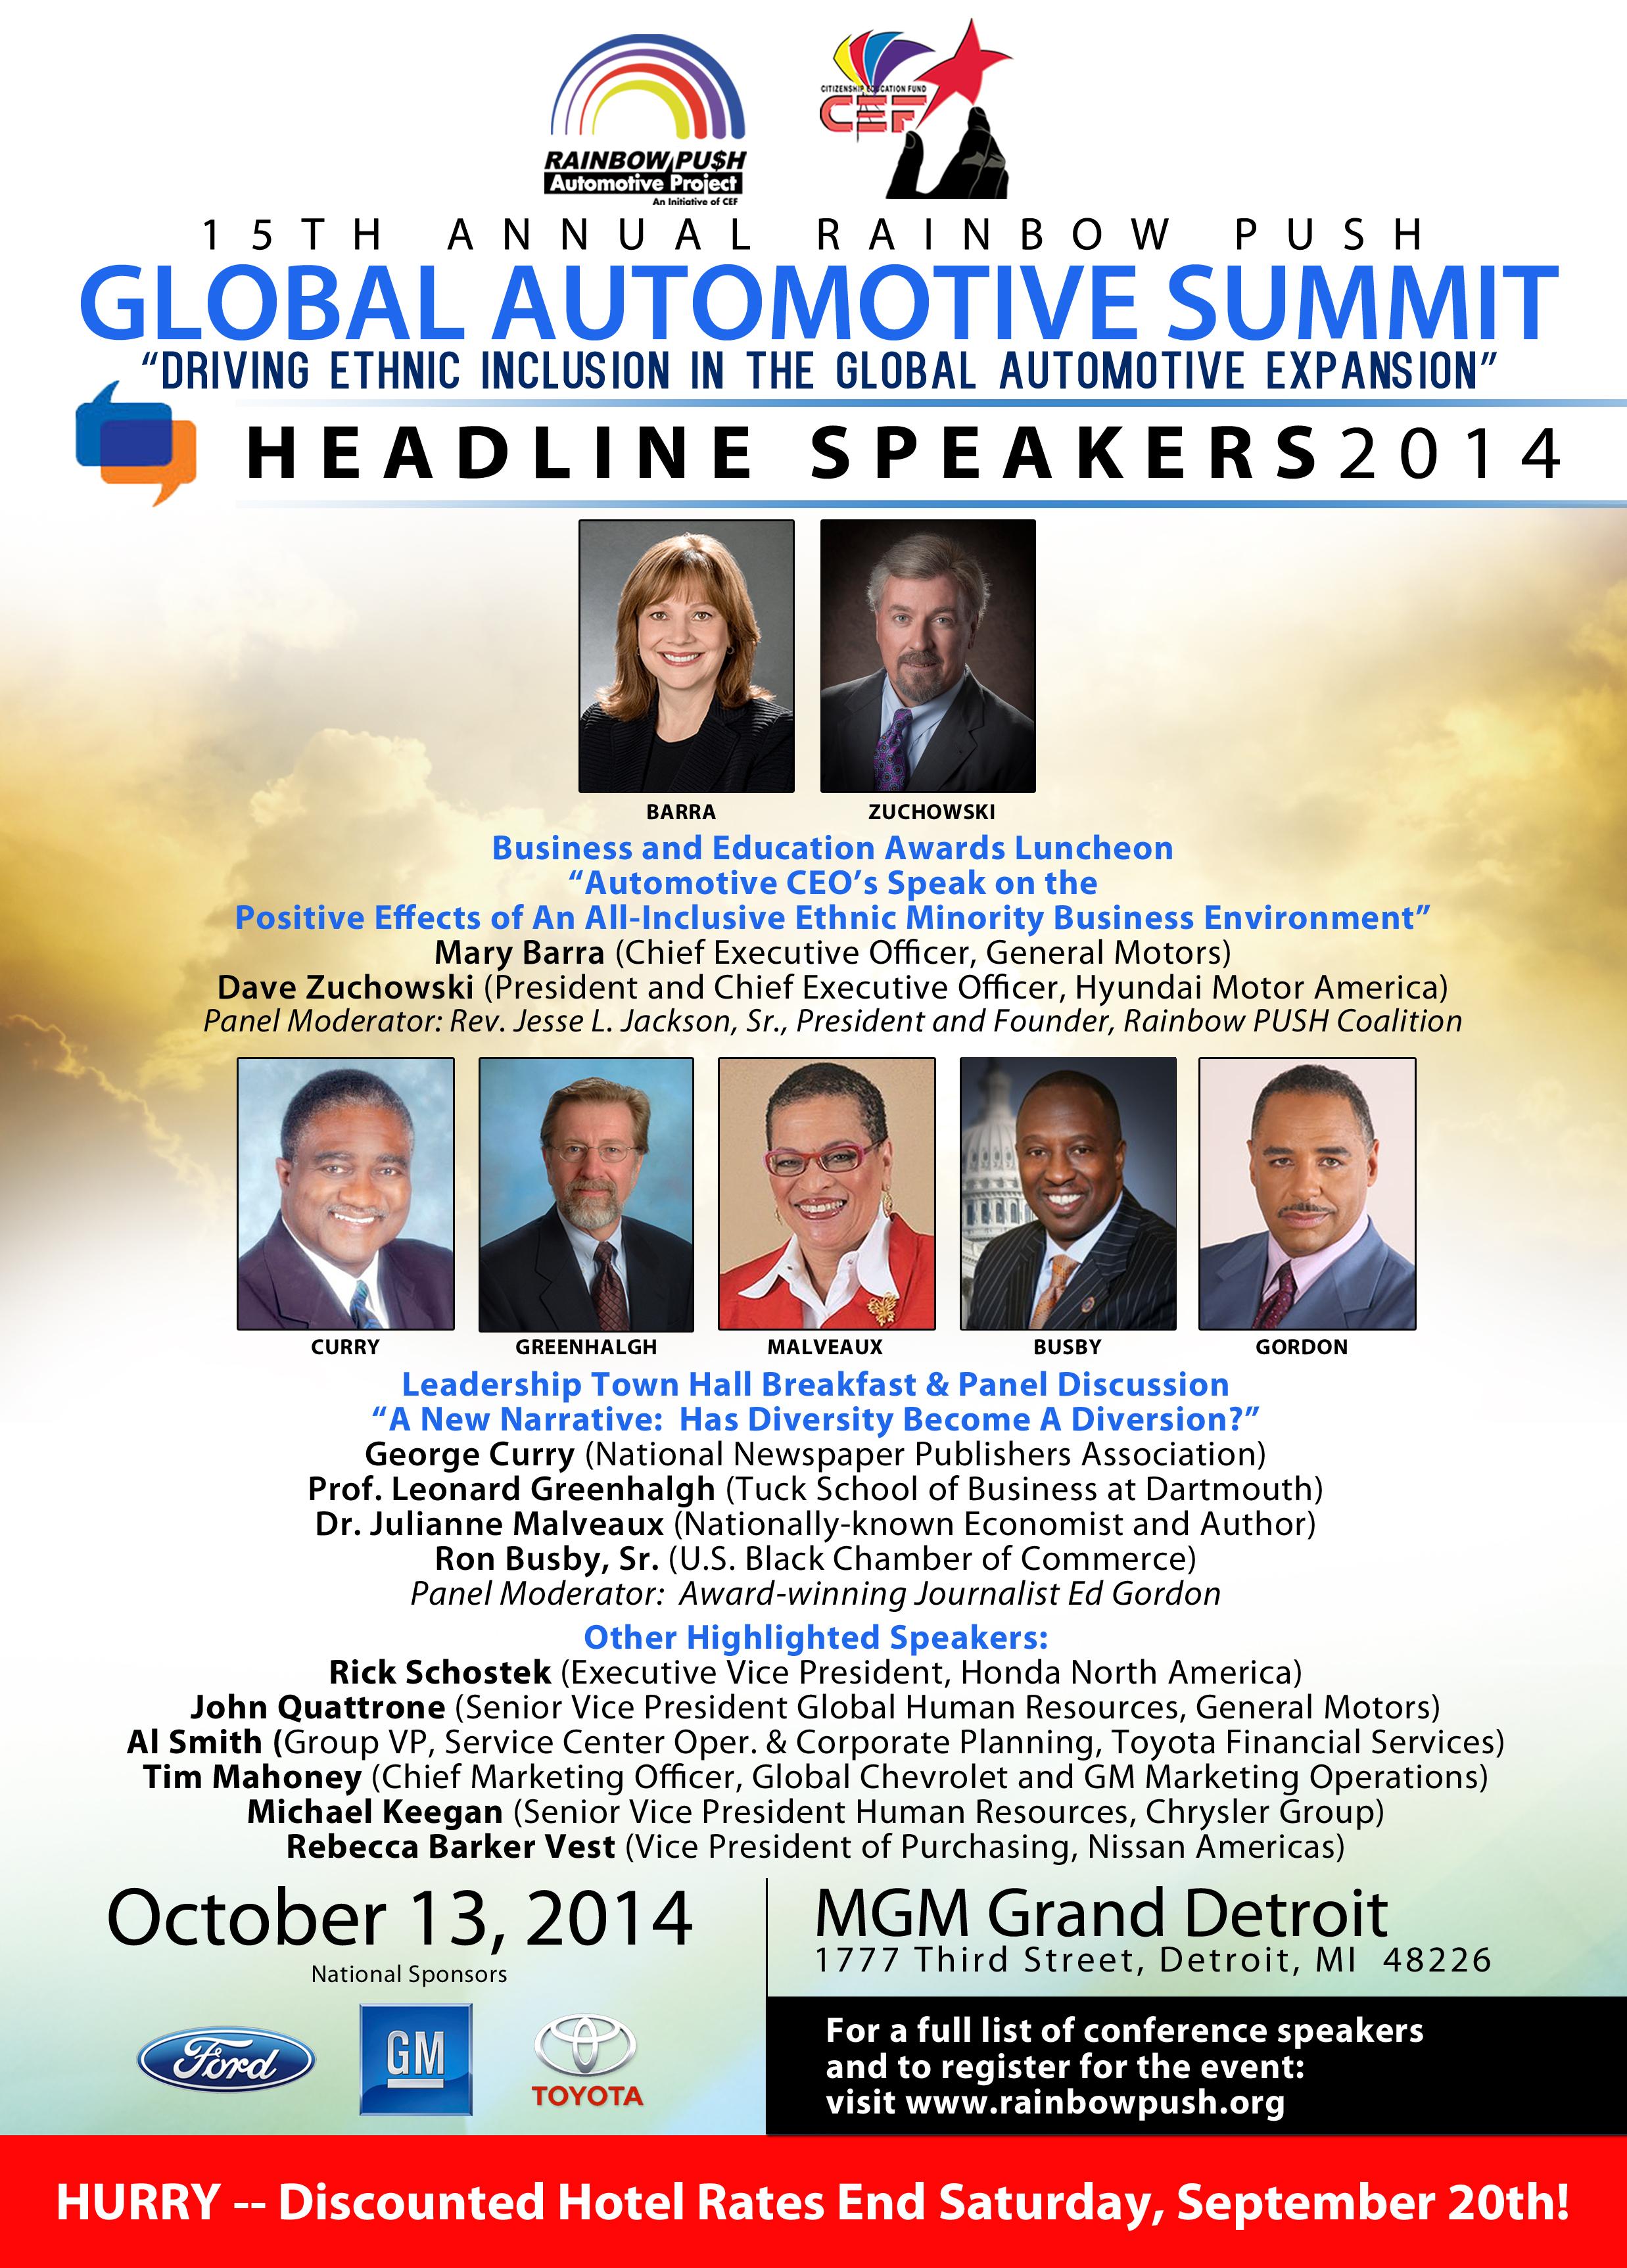 Rainbow PUSH Global Automotive Summit To Focus On Ethnic